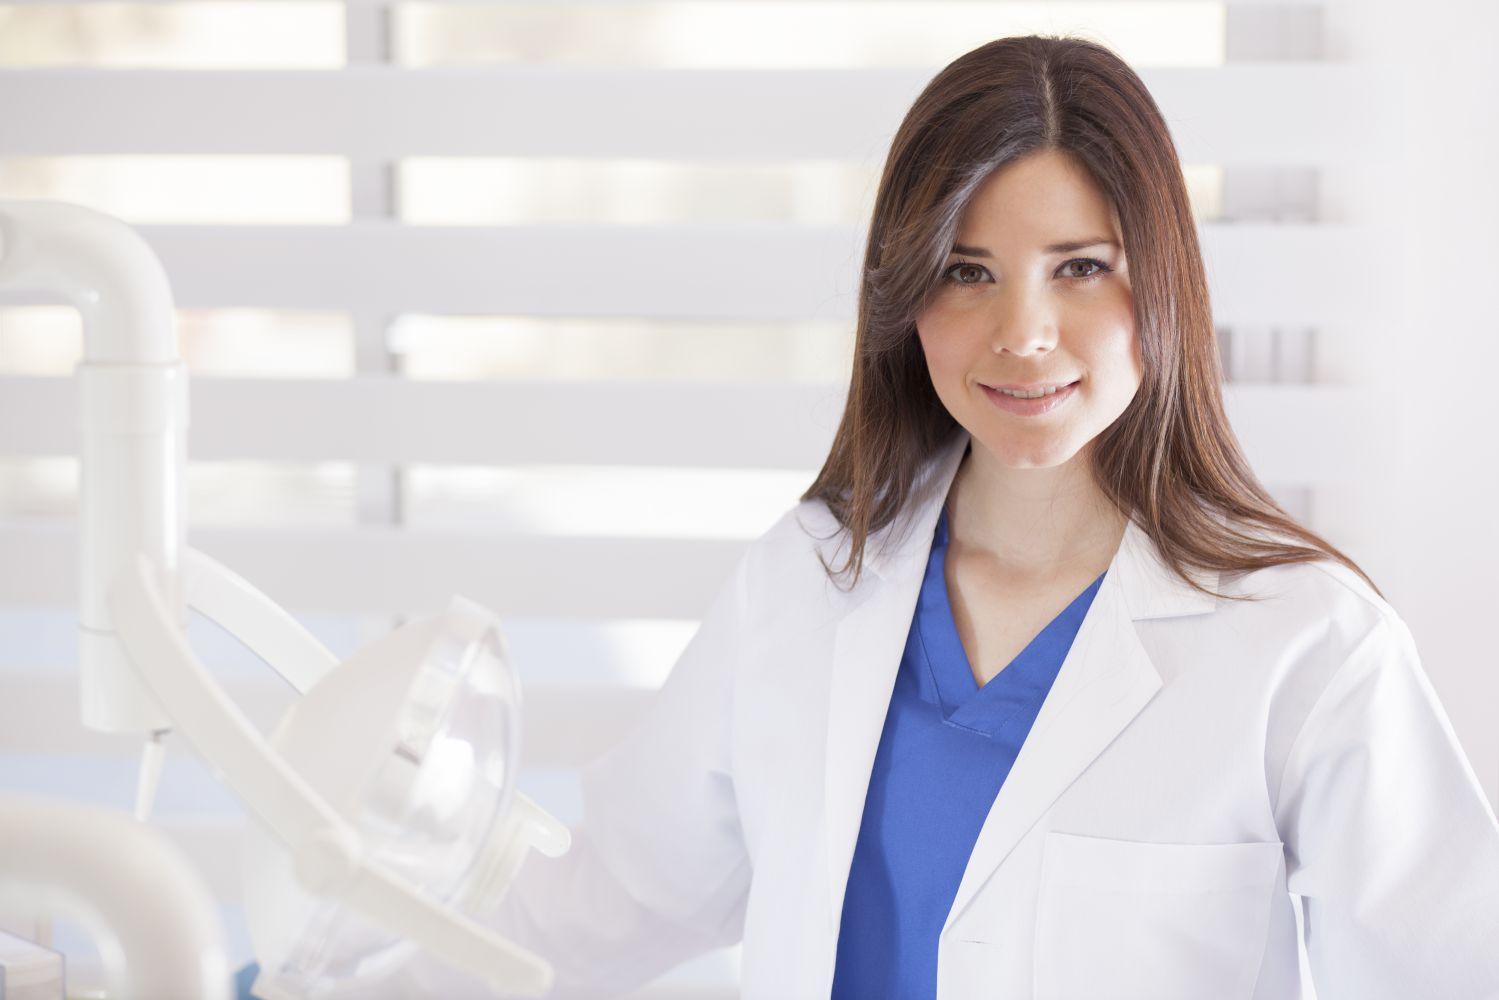 Professional dental care provider in Mason, OH